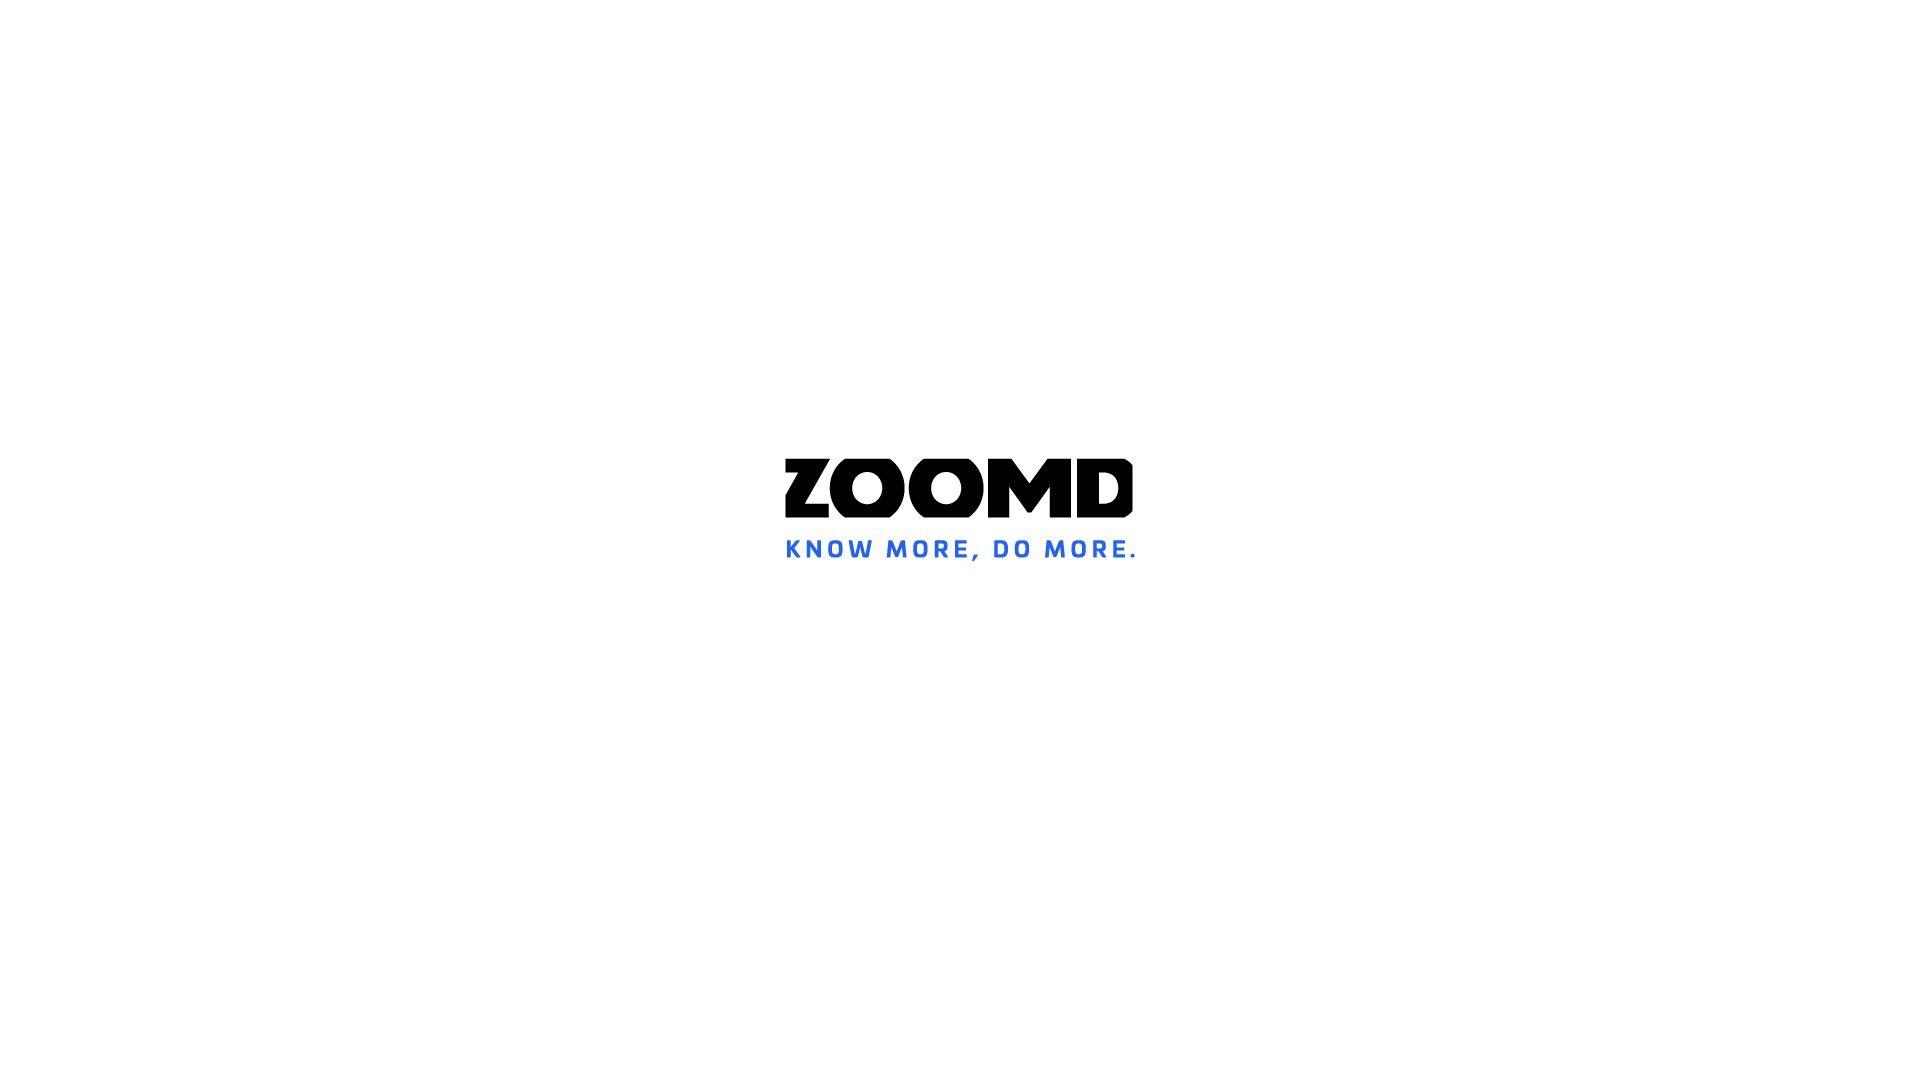 Fotografia Zoomd